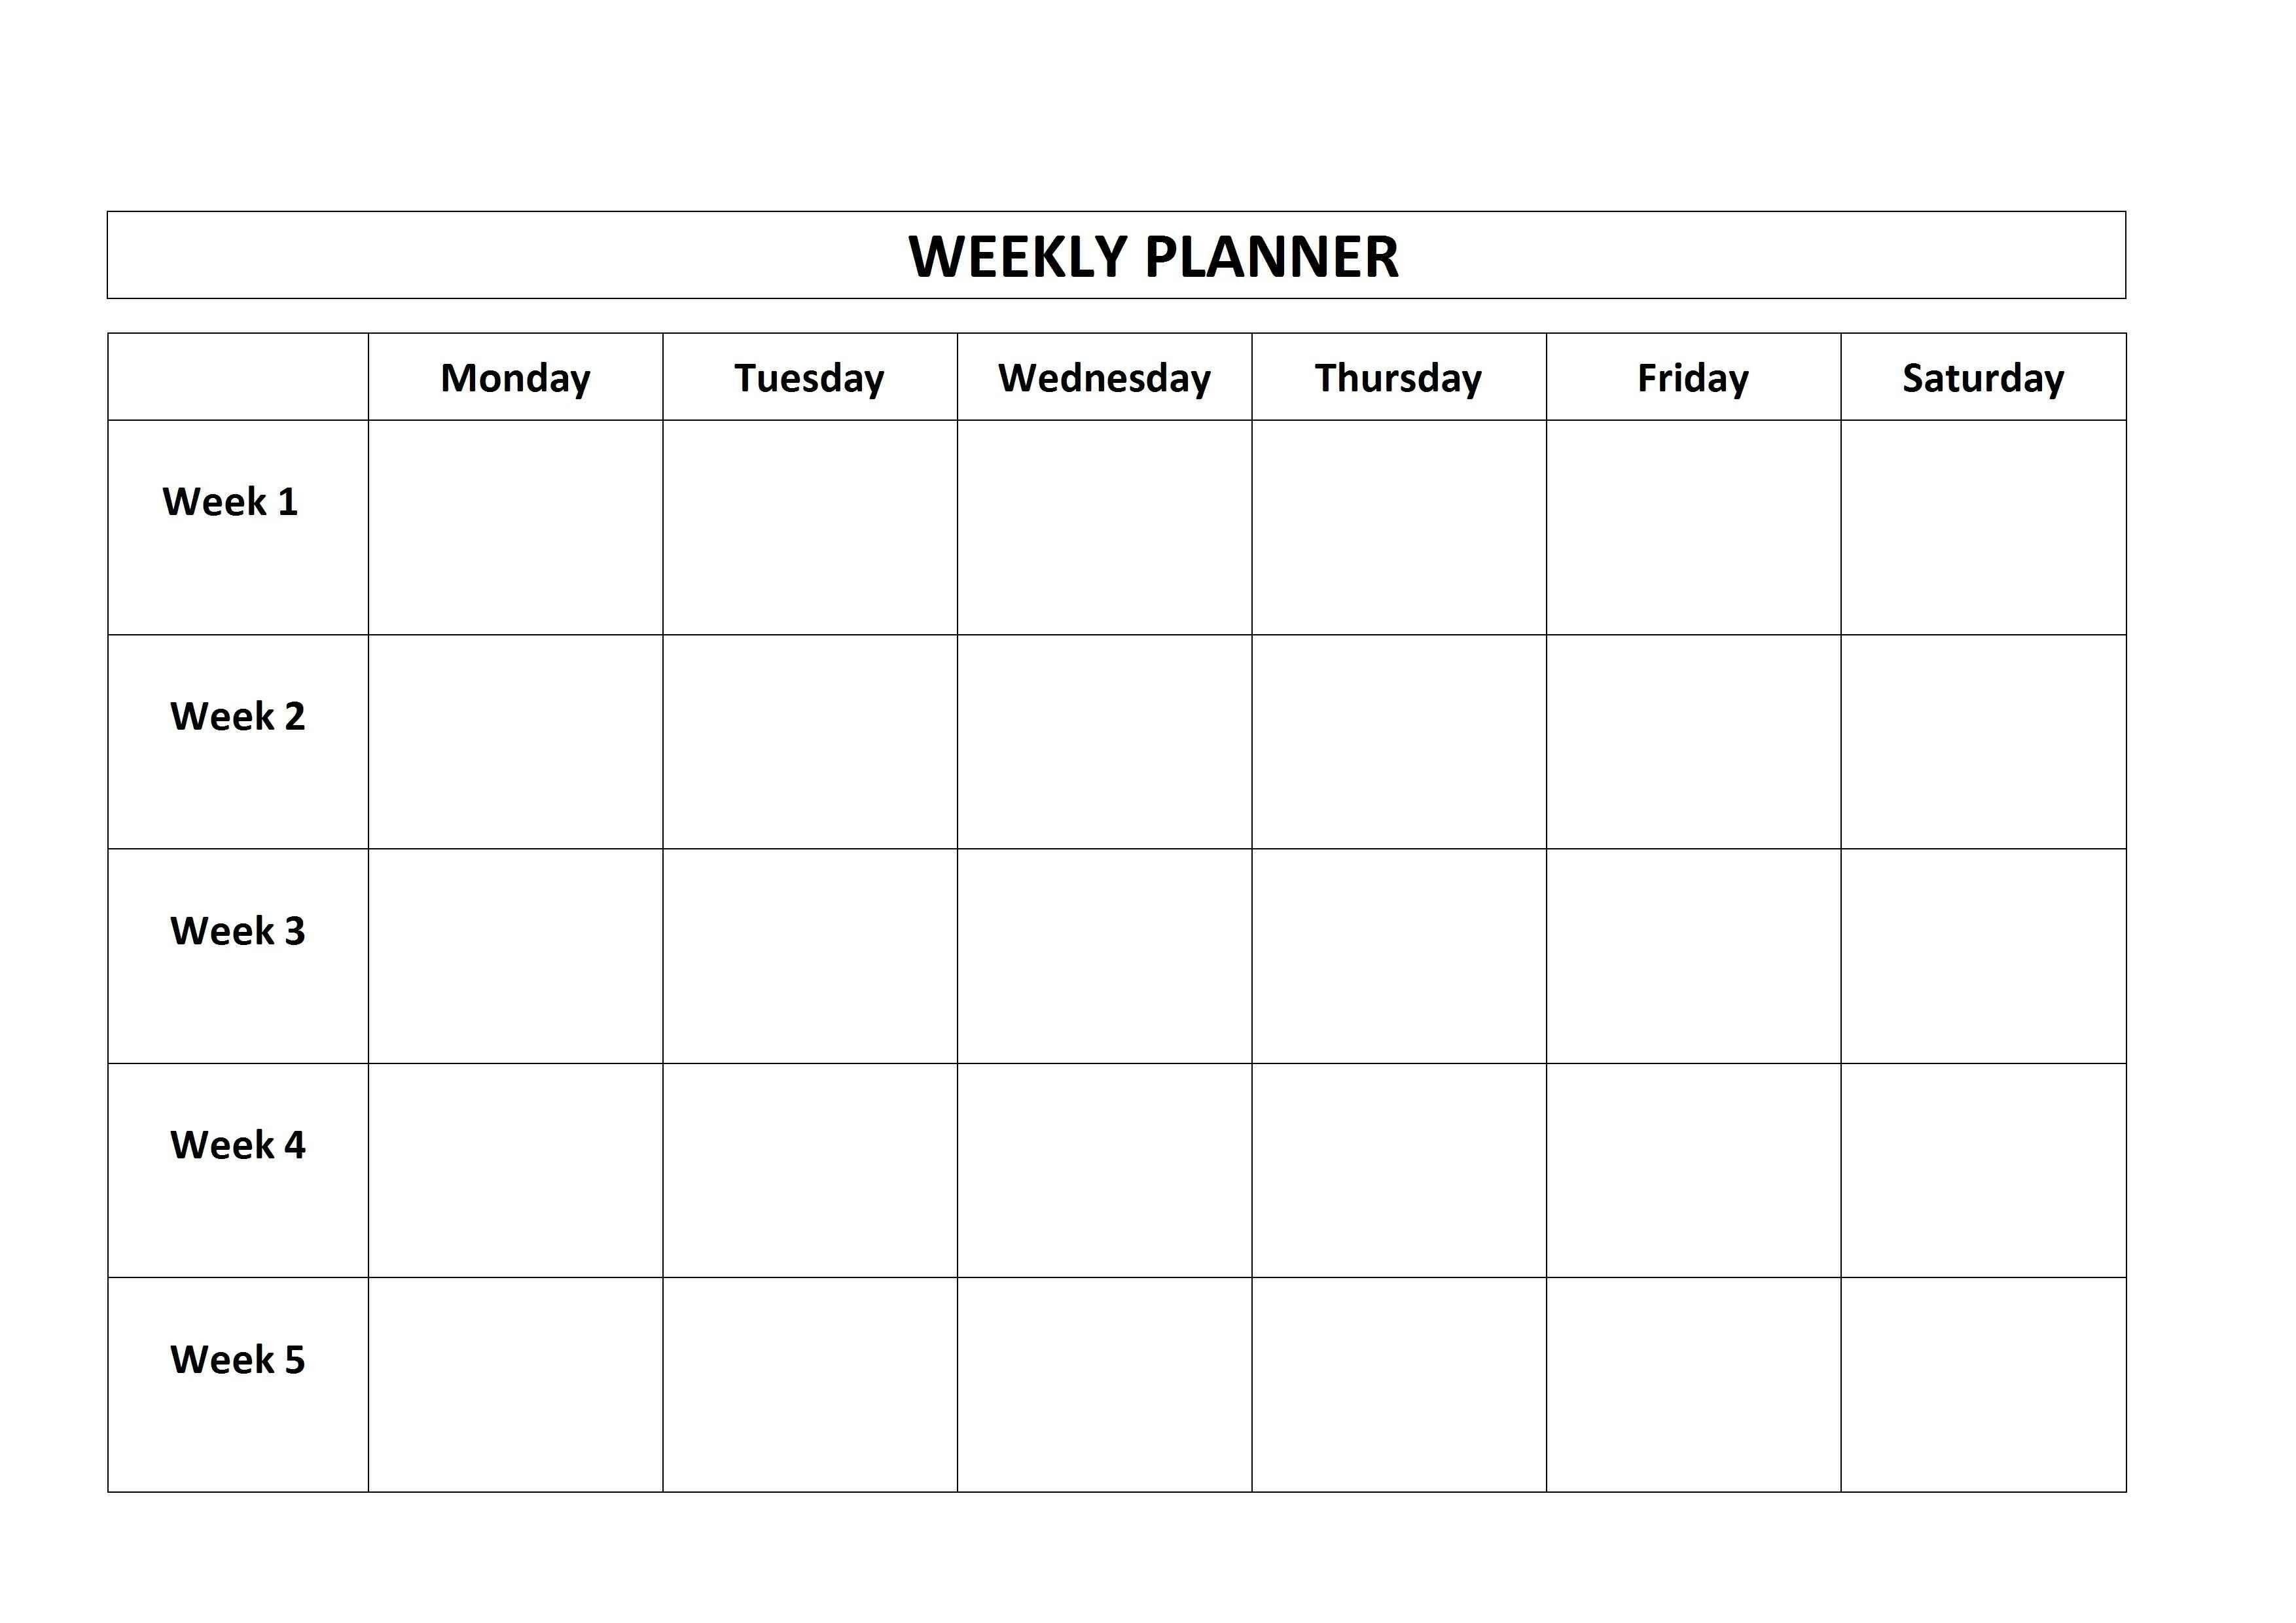 5 Day Calendar Template - Vaydile.euforic.co-Blank Calendar Template_5 Day Calendar Blank